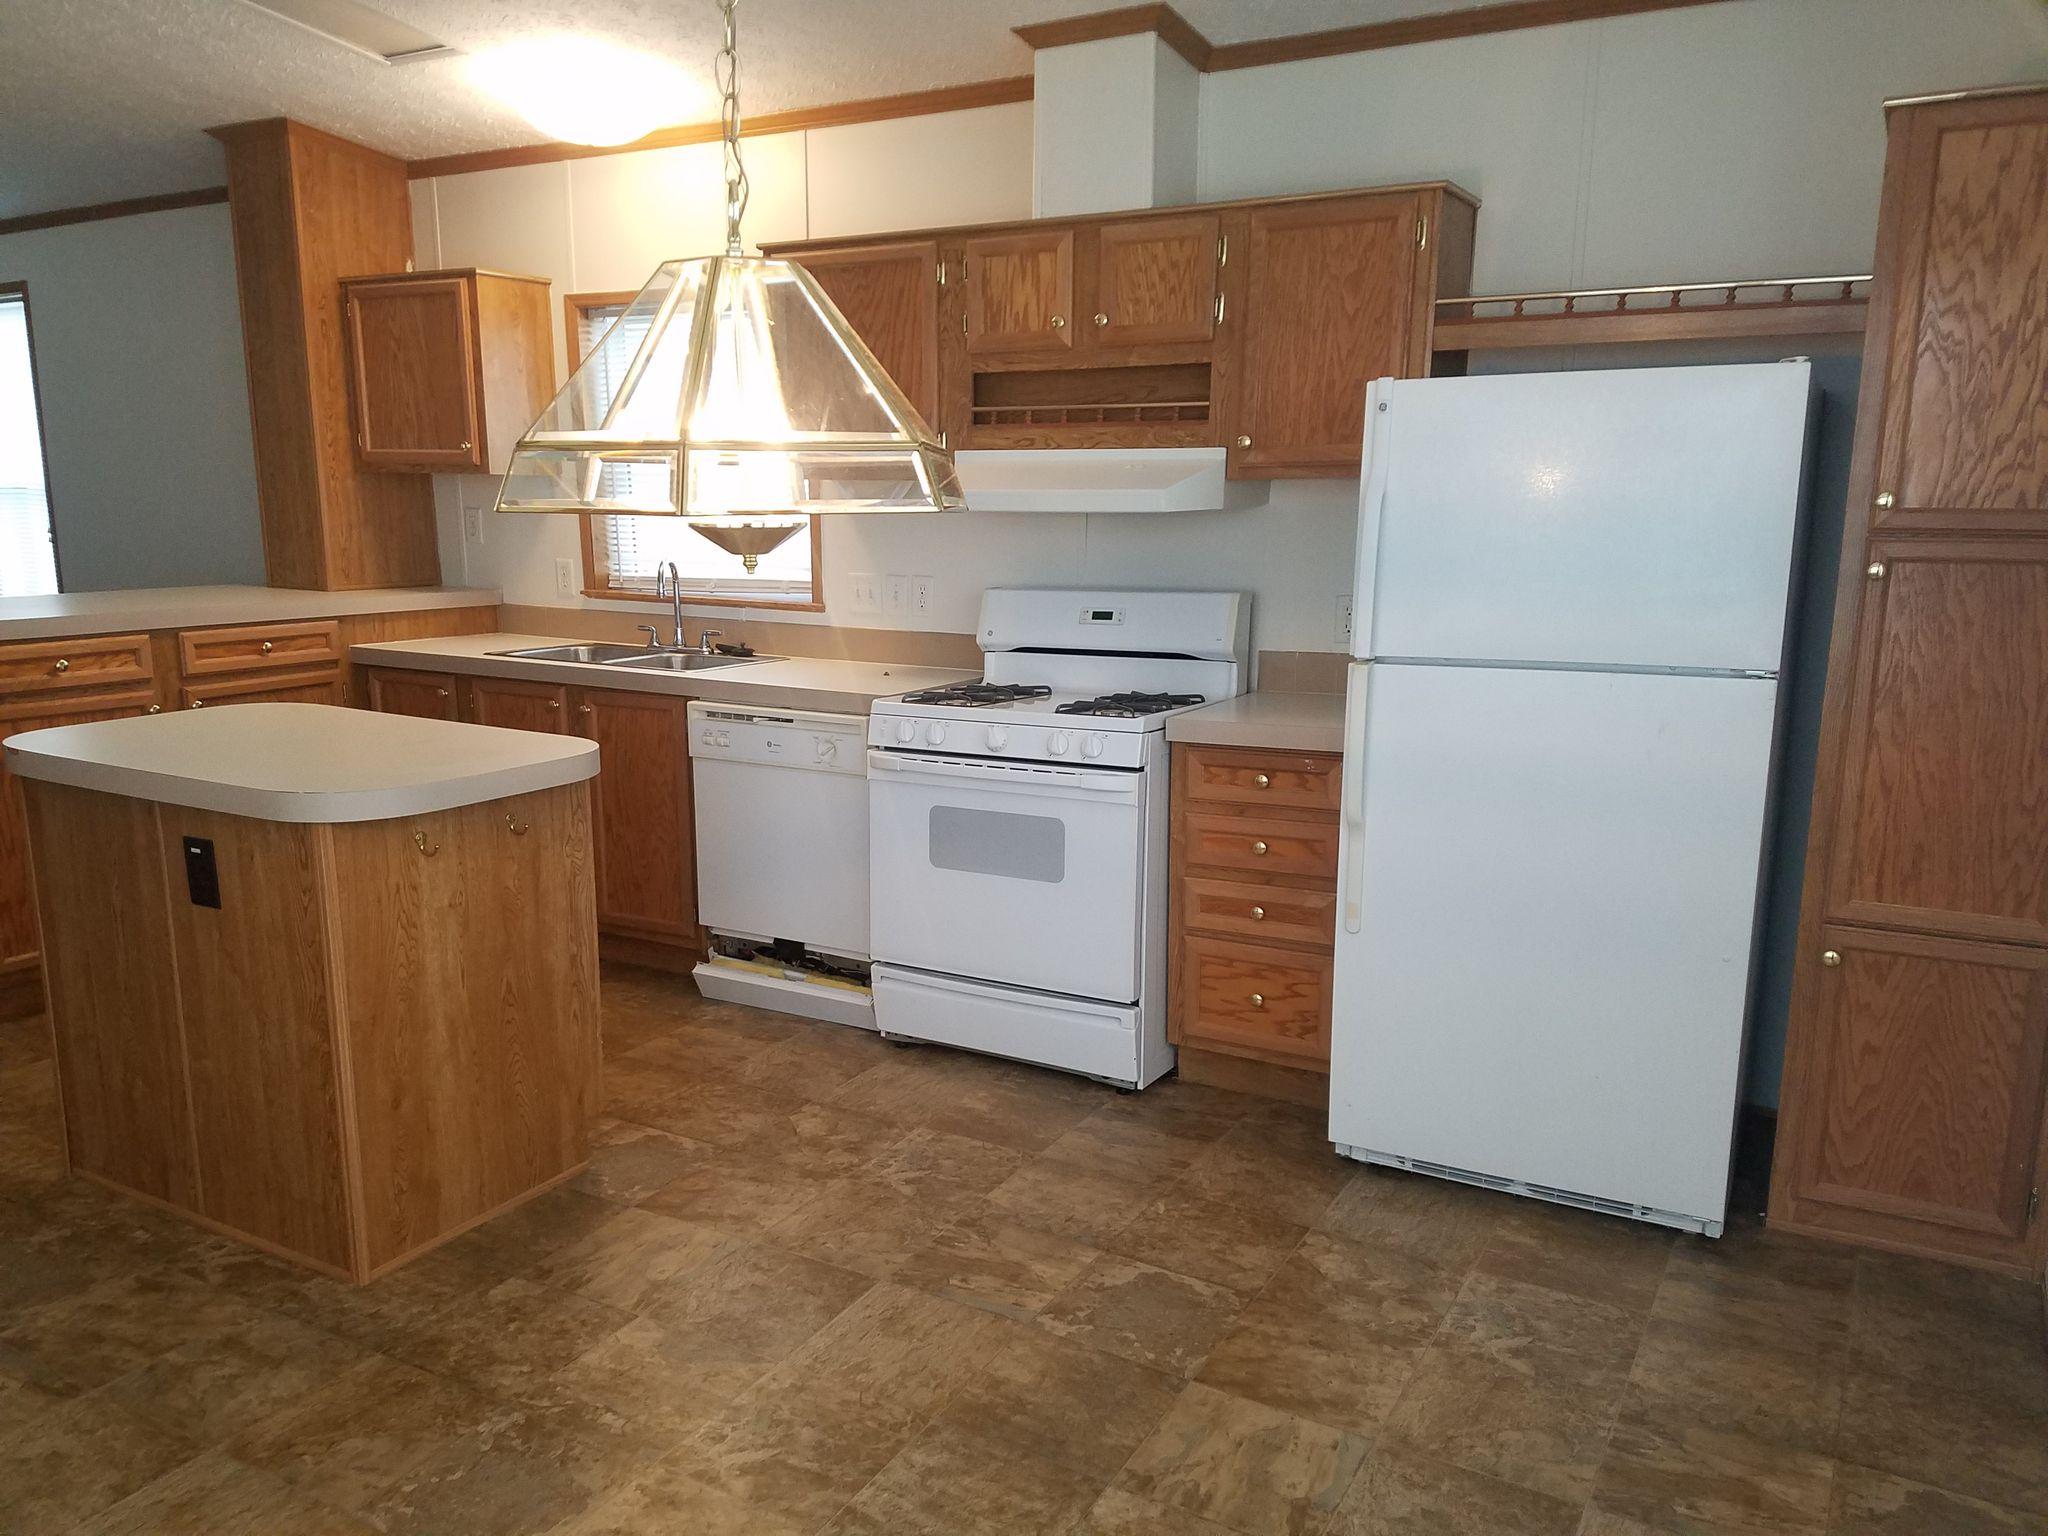 Kitchen cabinets miamisburg ohio - 11110 Sapling Dr